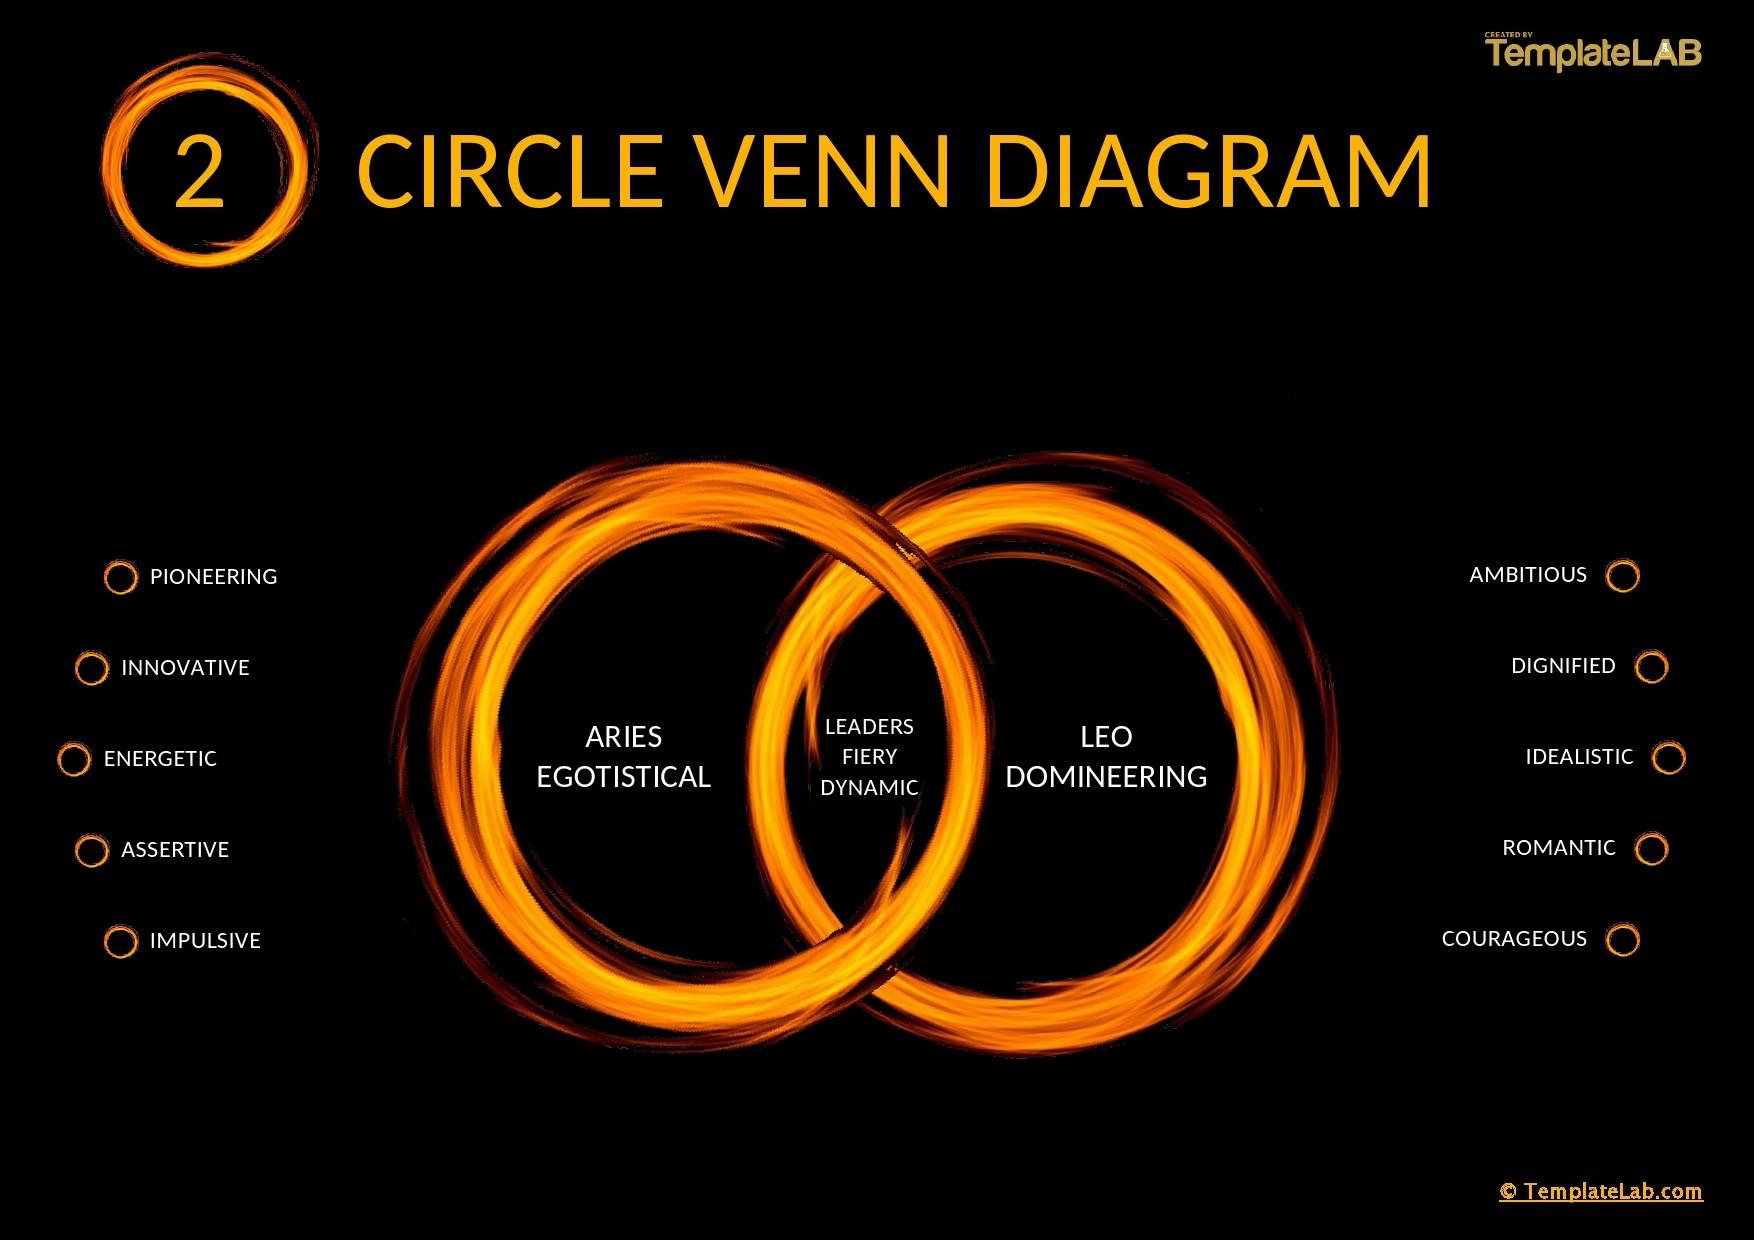 Free 2 Circle Venn Diagram Template 03 - TemplateLab.com